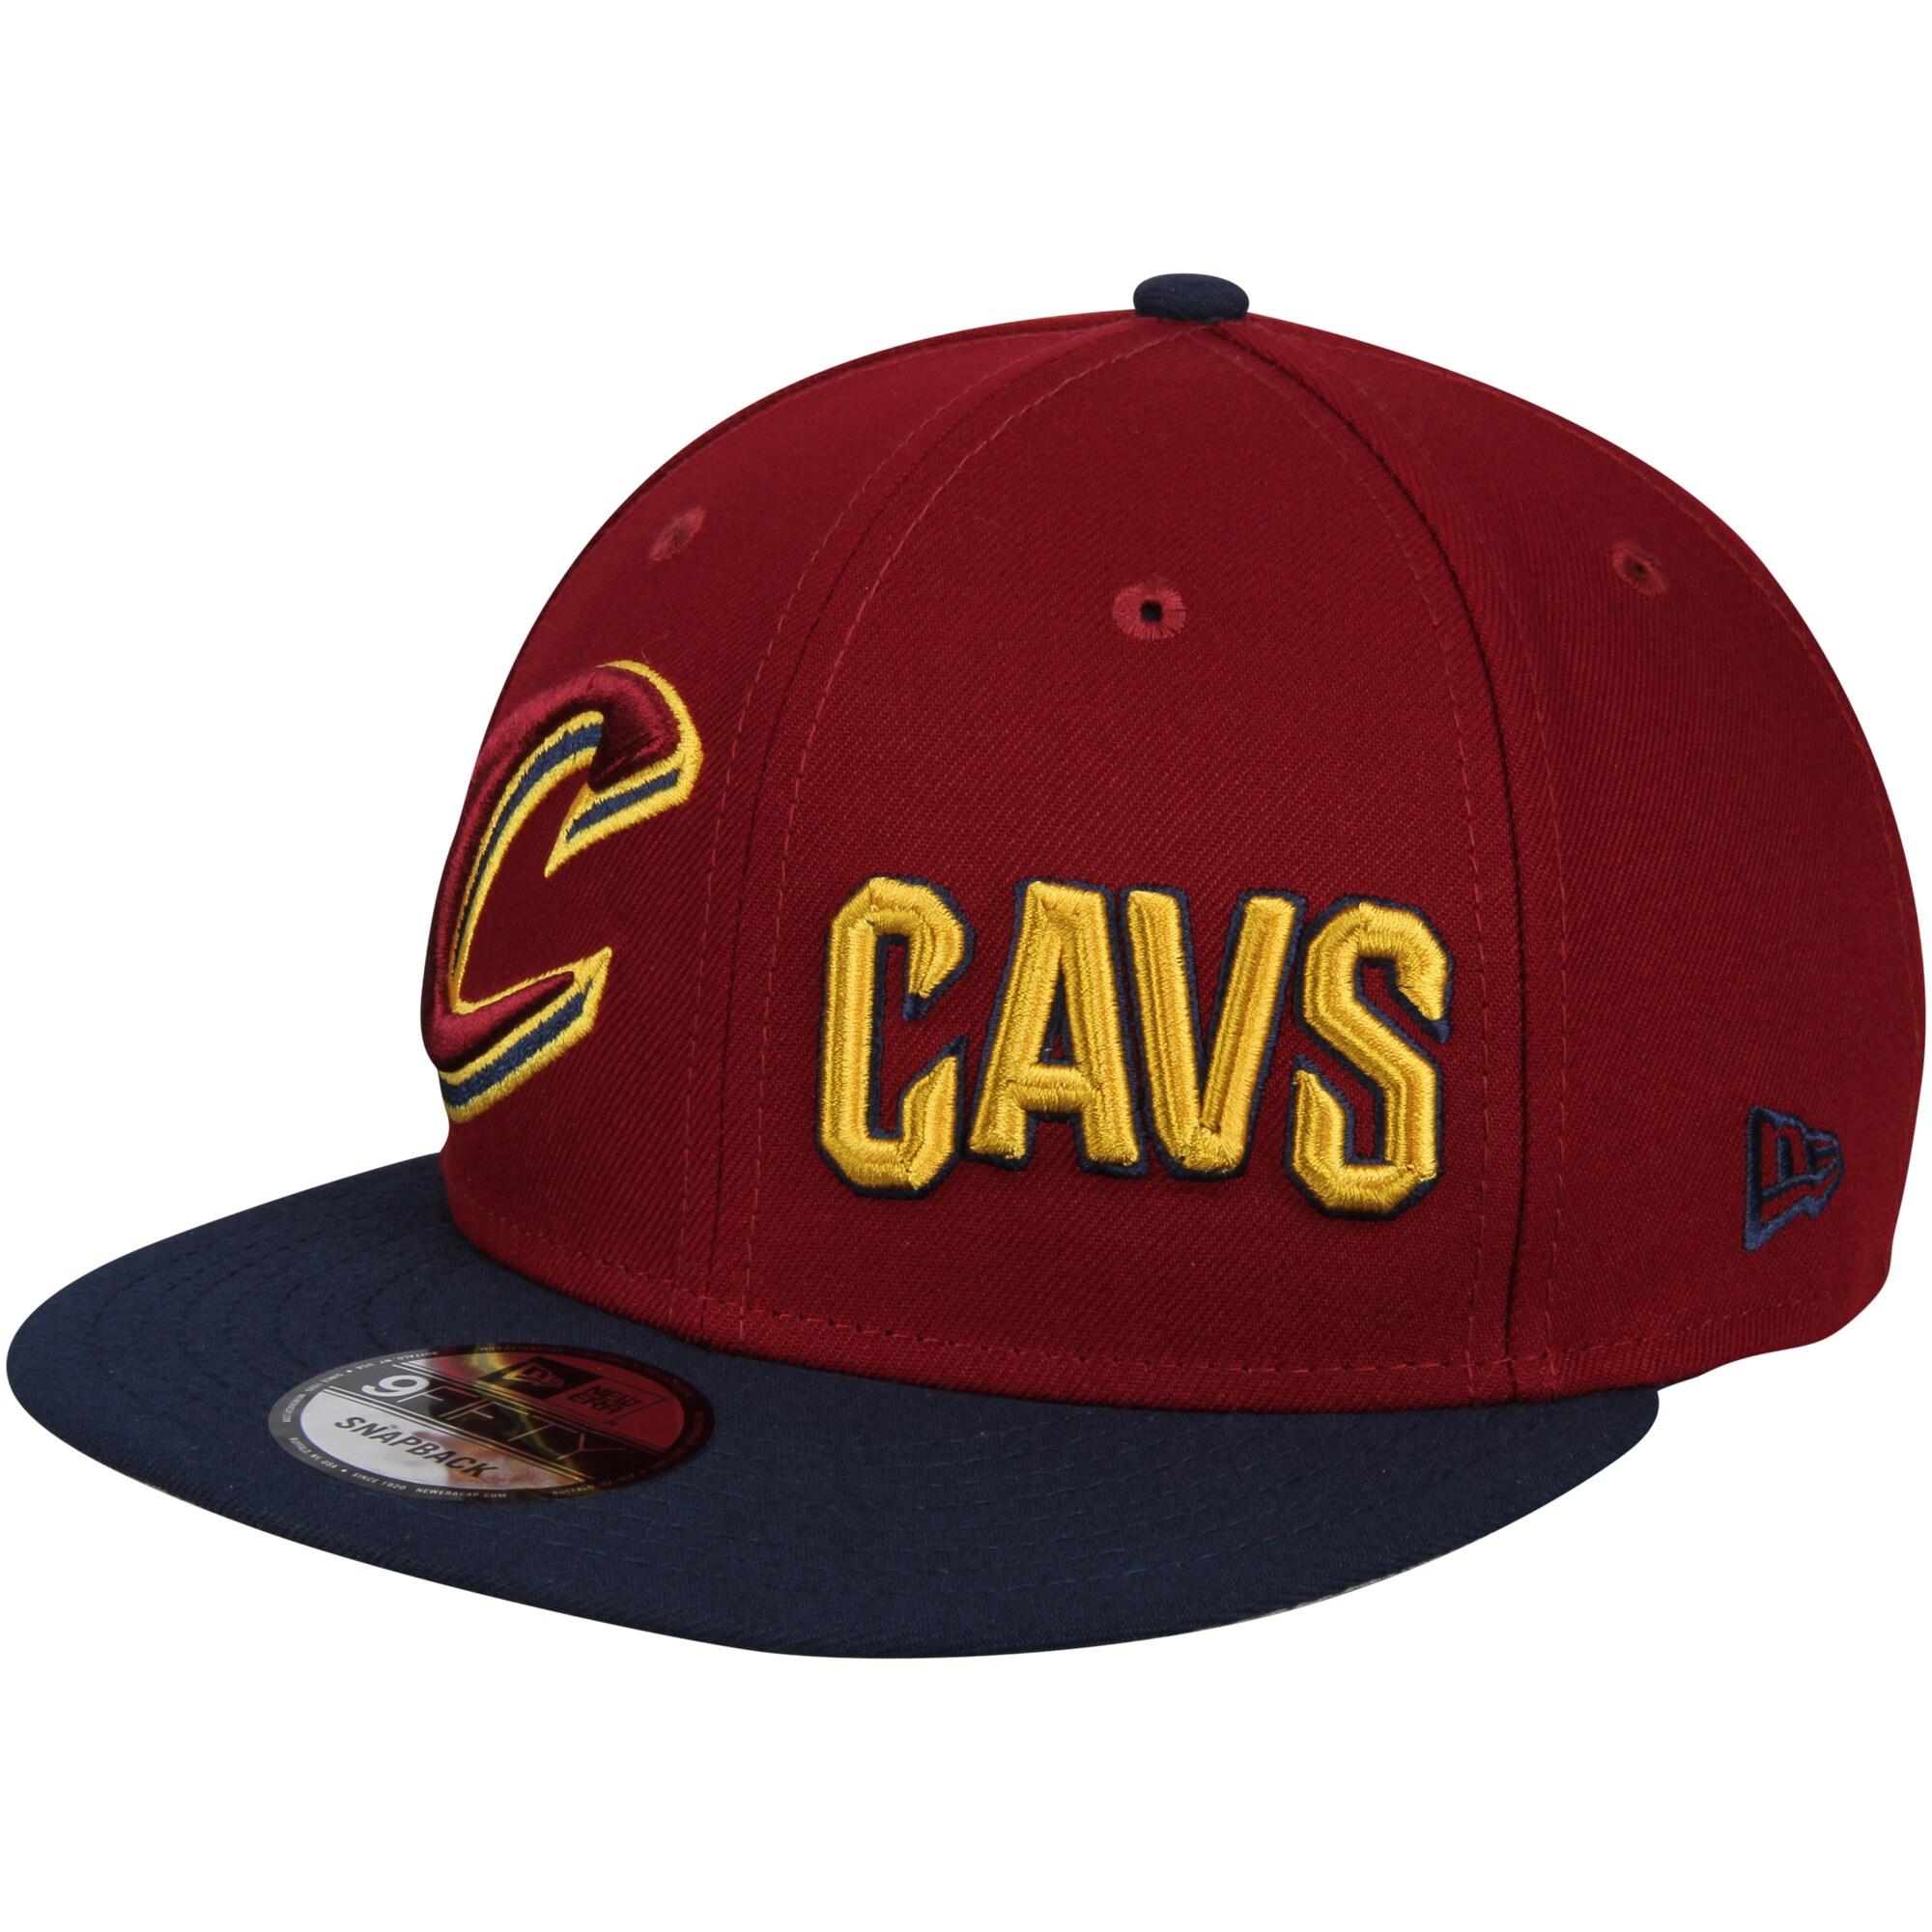 Cleveland Cavaliers New Era Y2K Double Whammy 9FIFTY Adjustable Snapback Hat - Wine/Navy